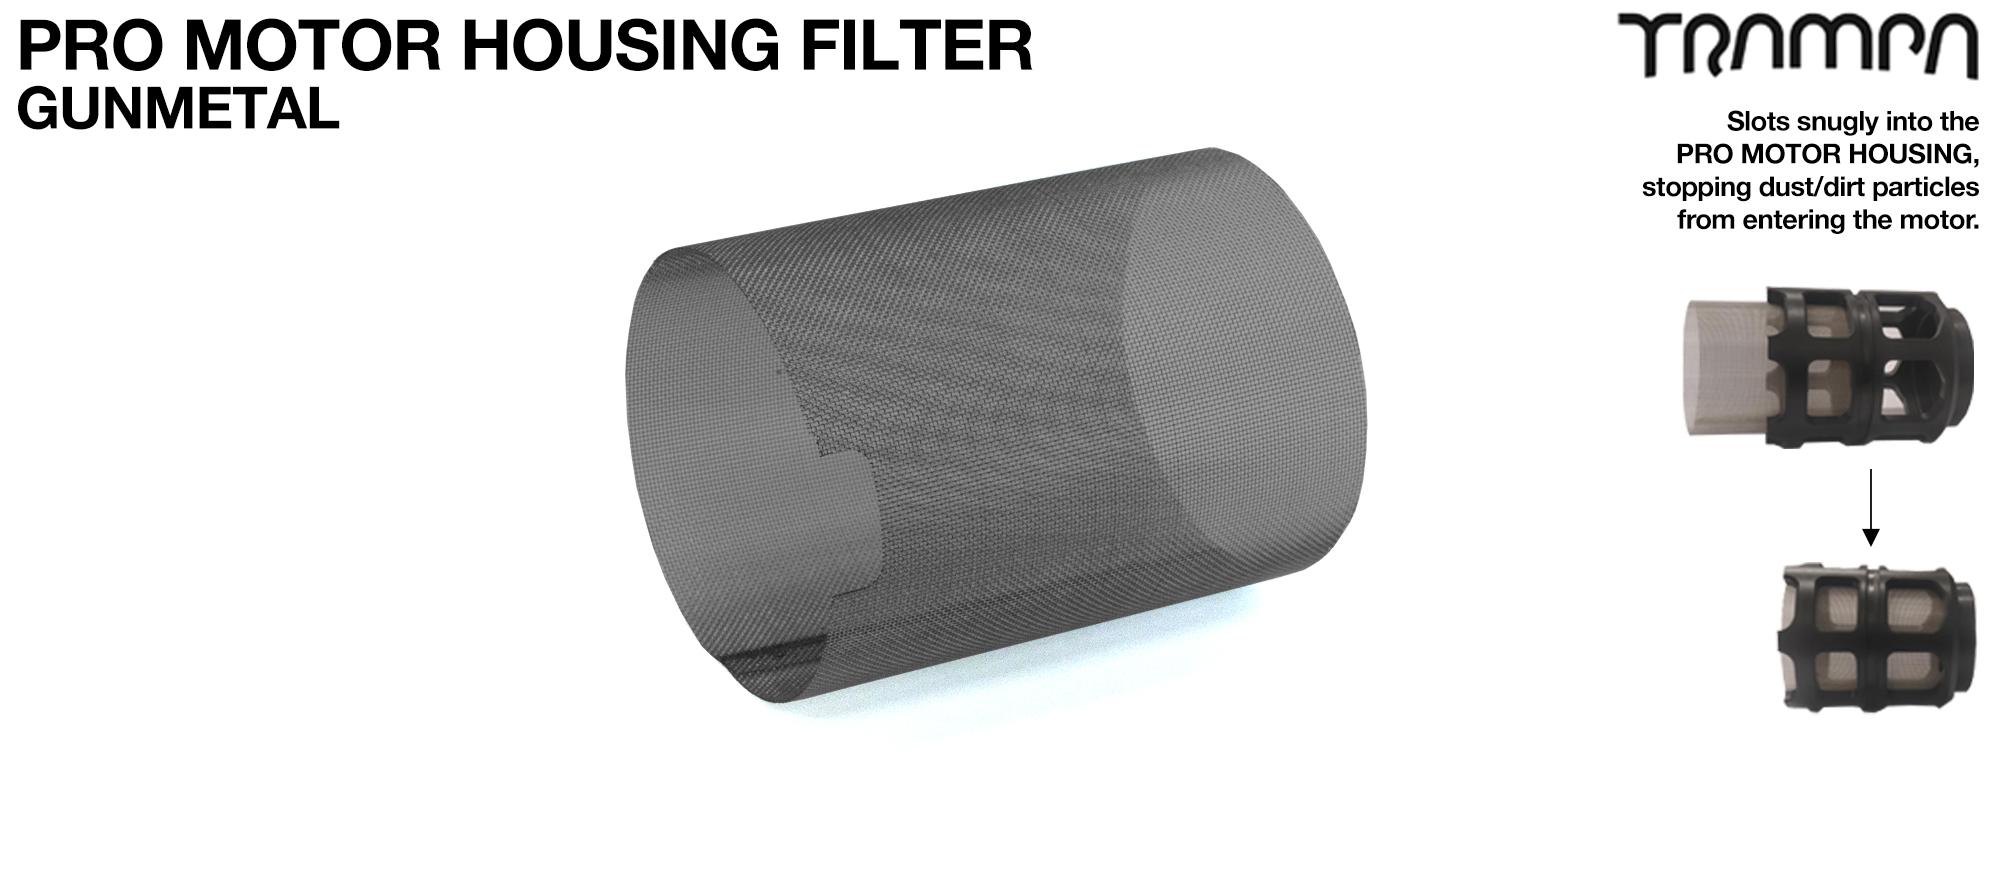 Motor Protection Cover MESH FILTER - GUNMETAL